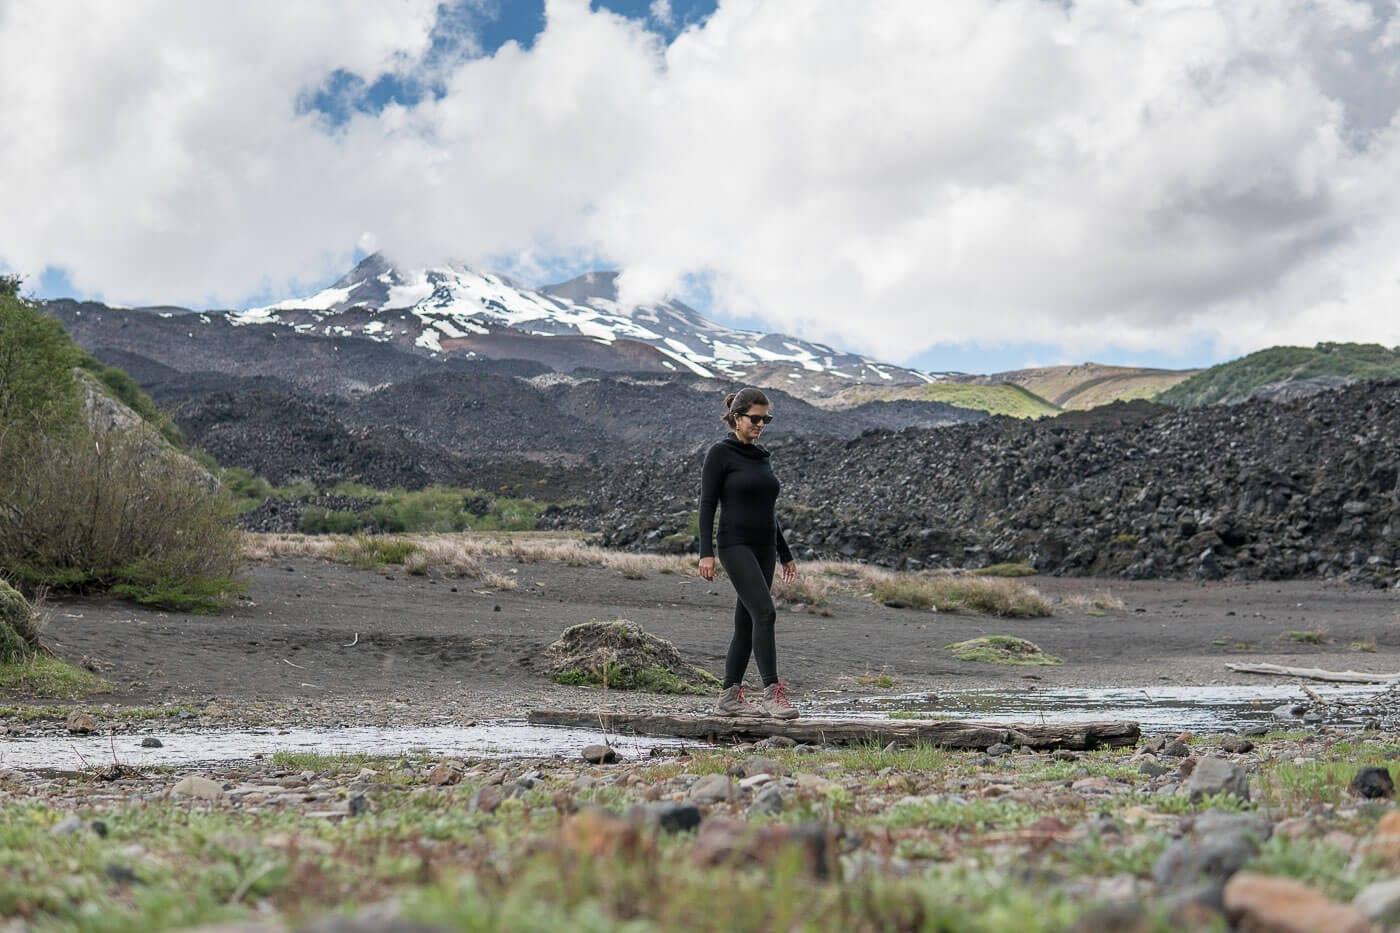 O que fazer em Chillán Neve Termas de Chillán - Trekking 1